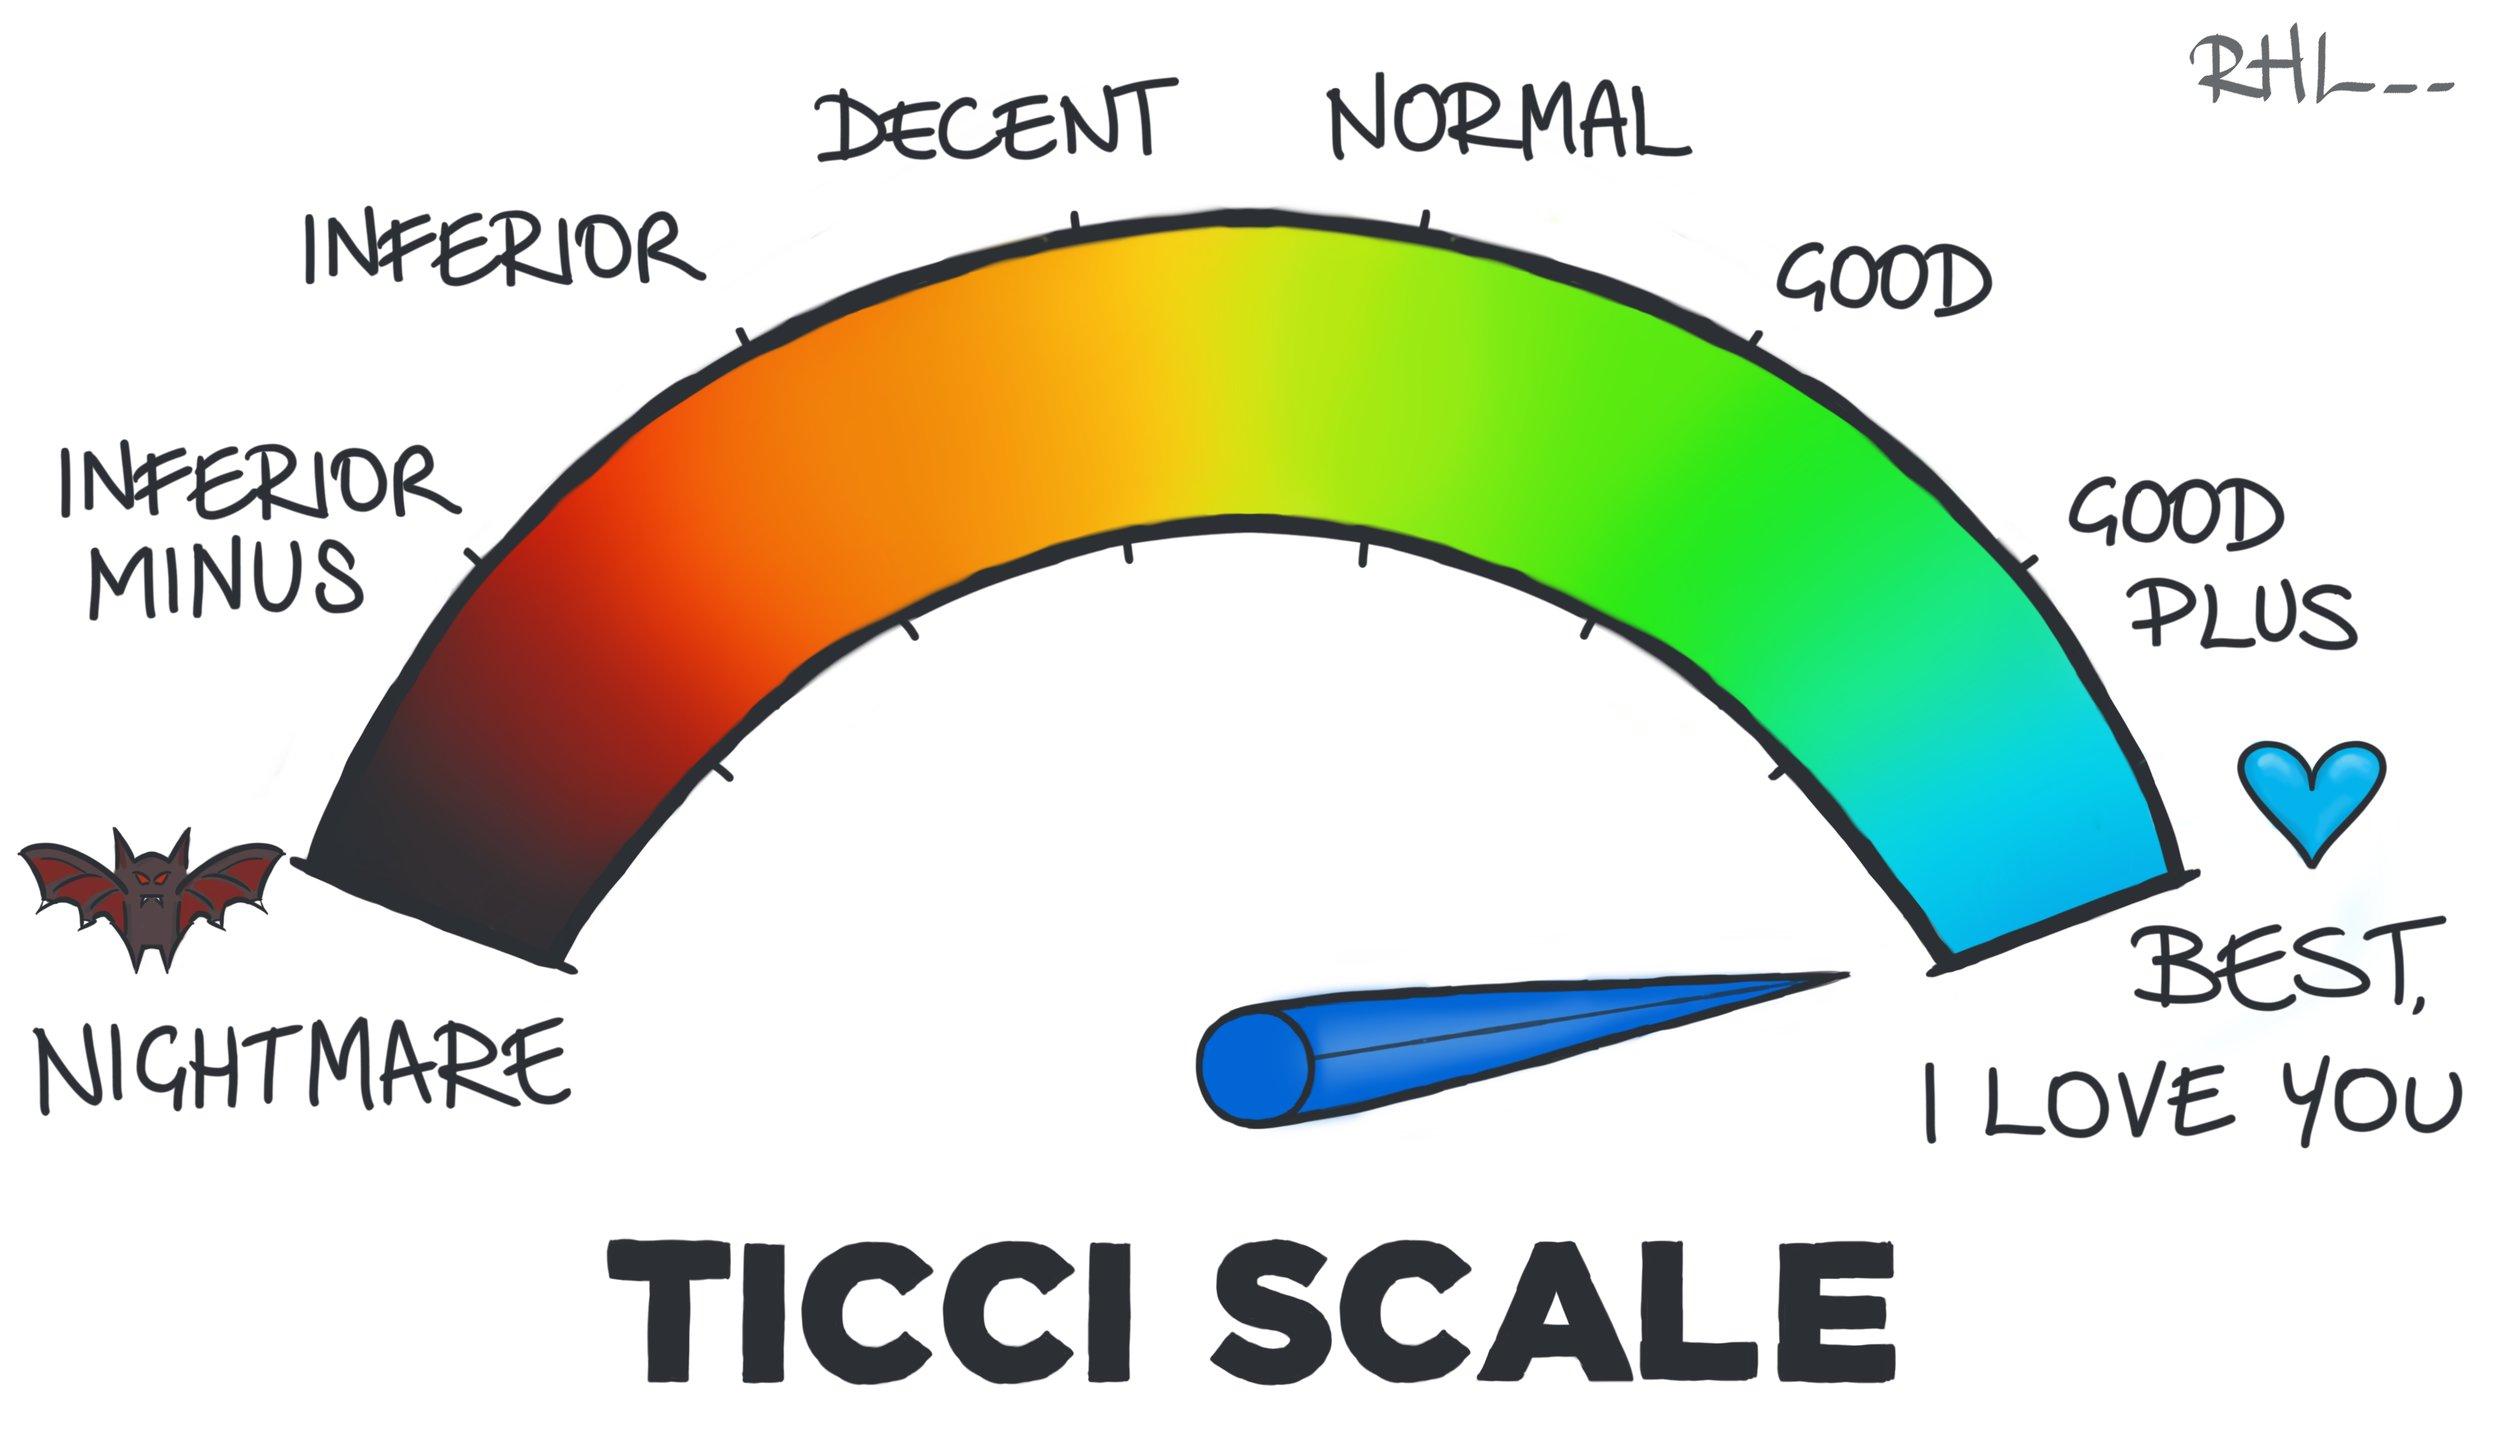 The Ticci Scale